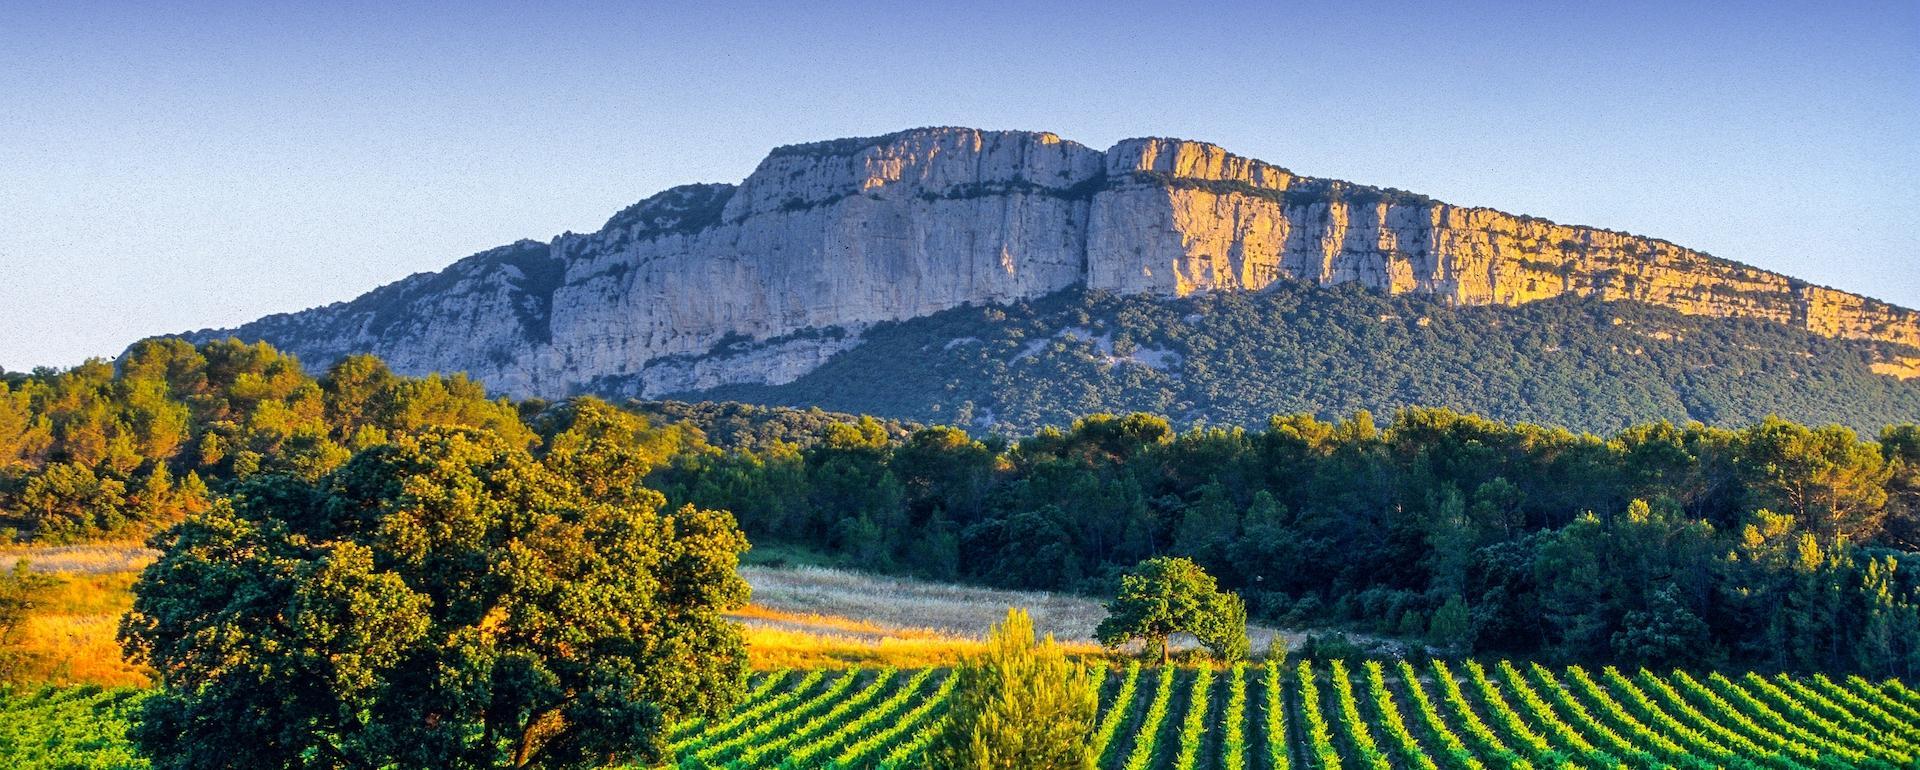 Vignoble Pic Saint Loup - Hérault